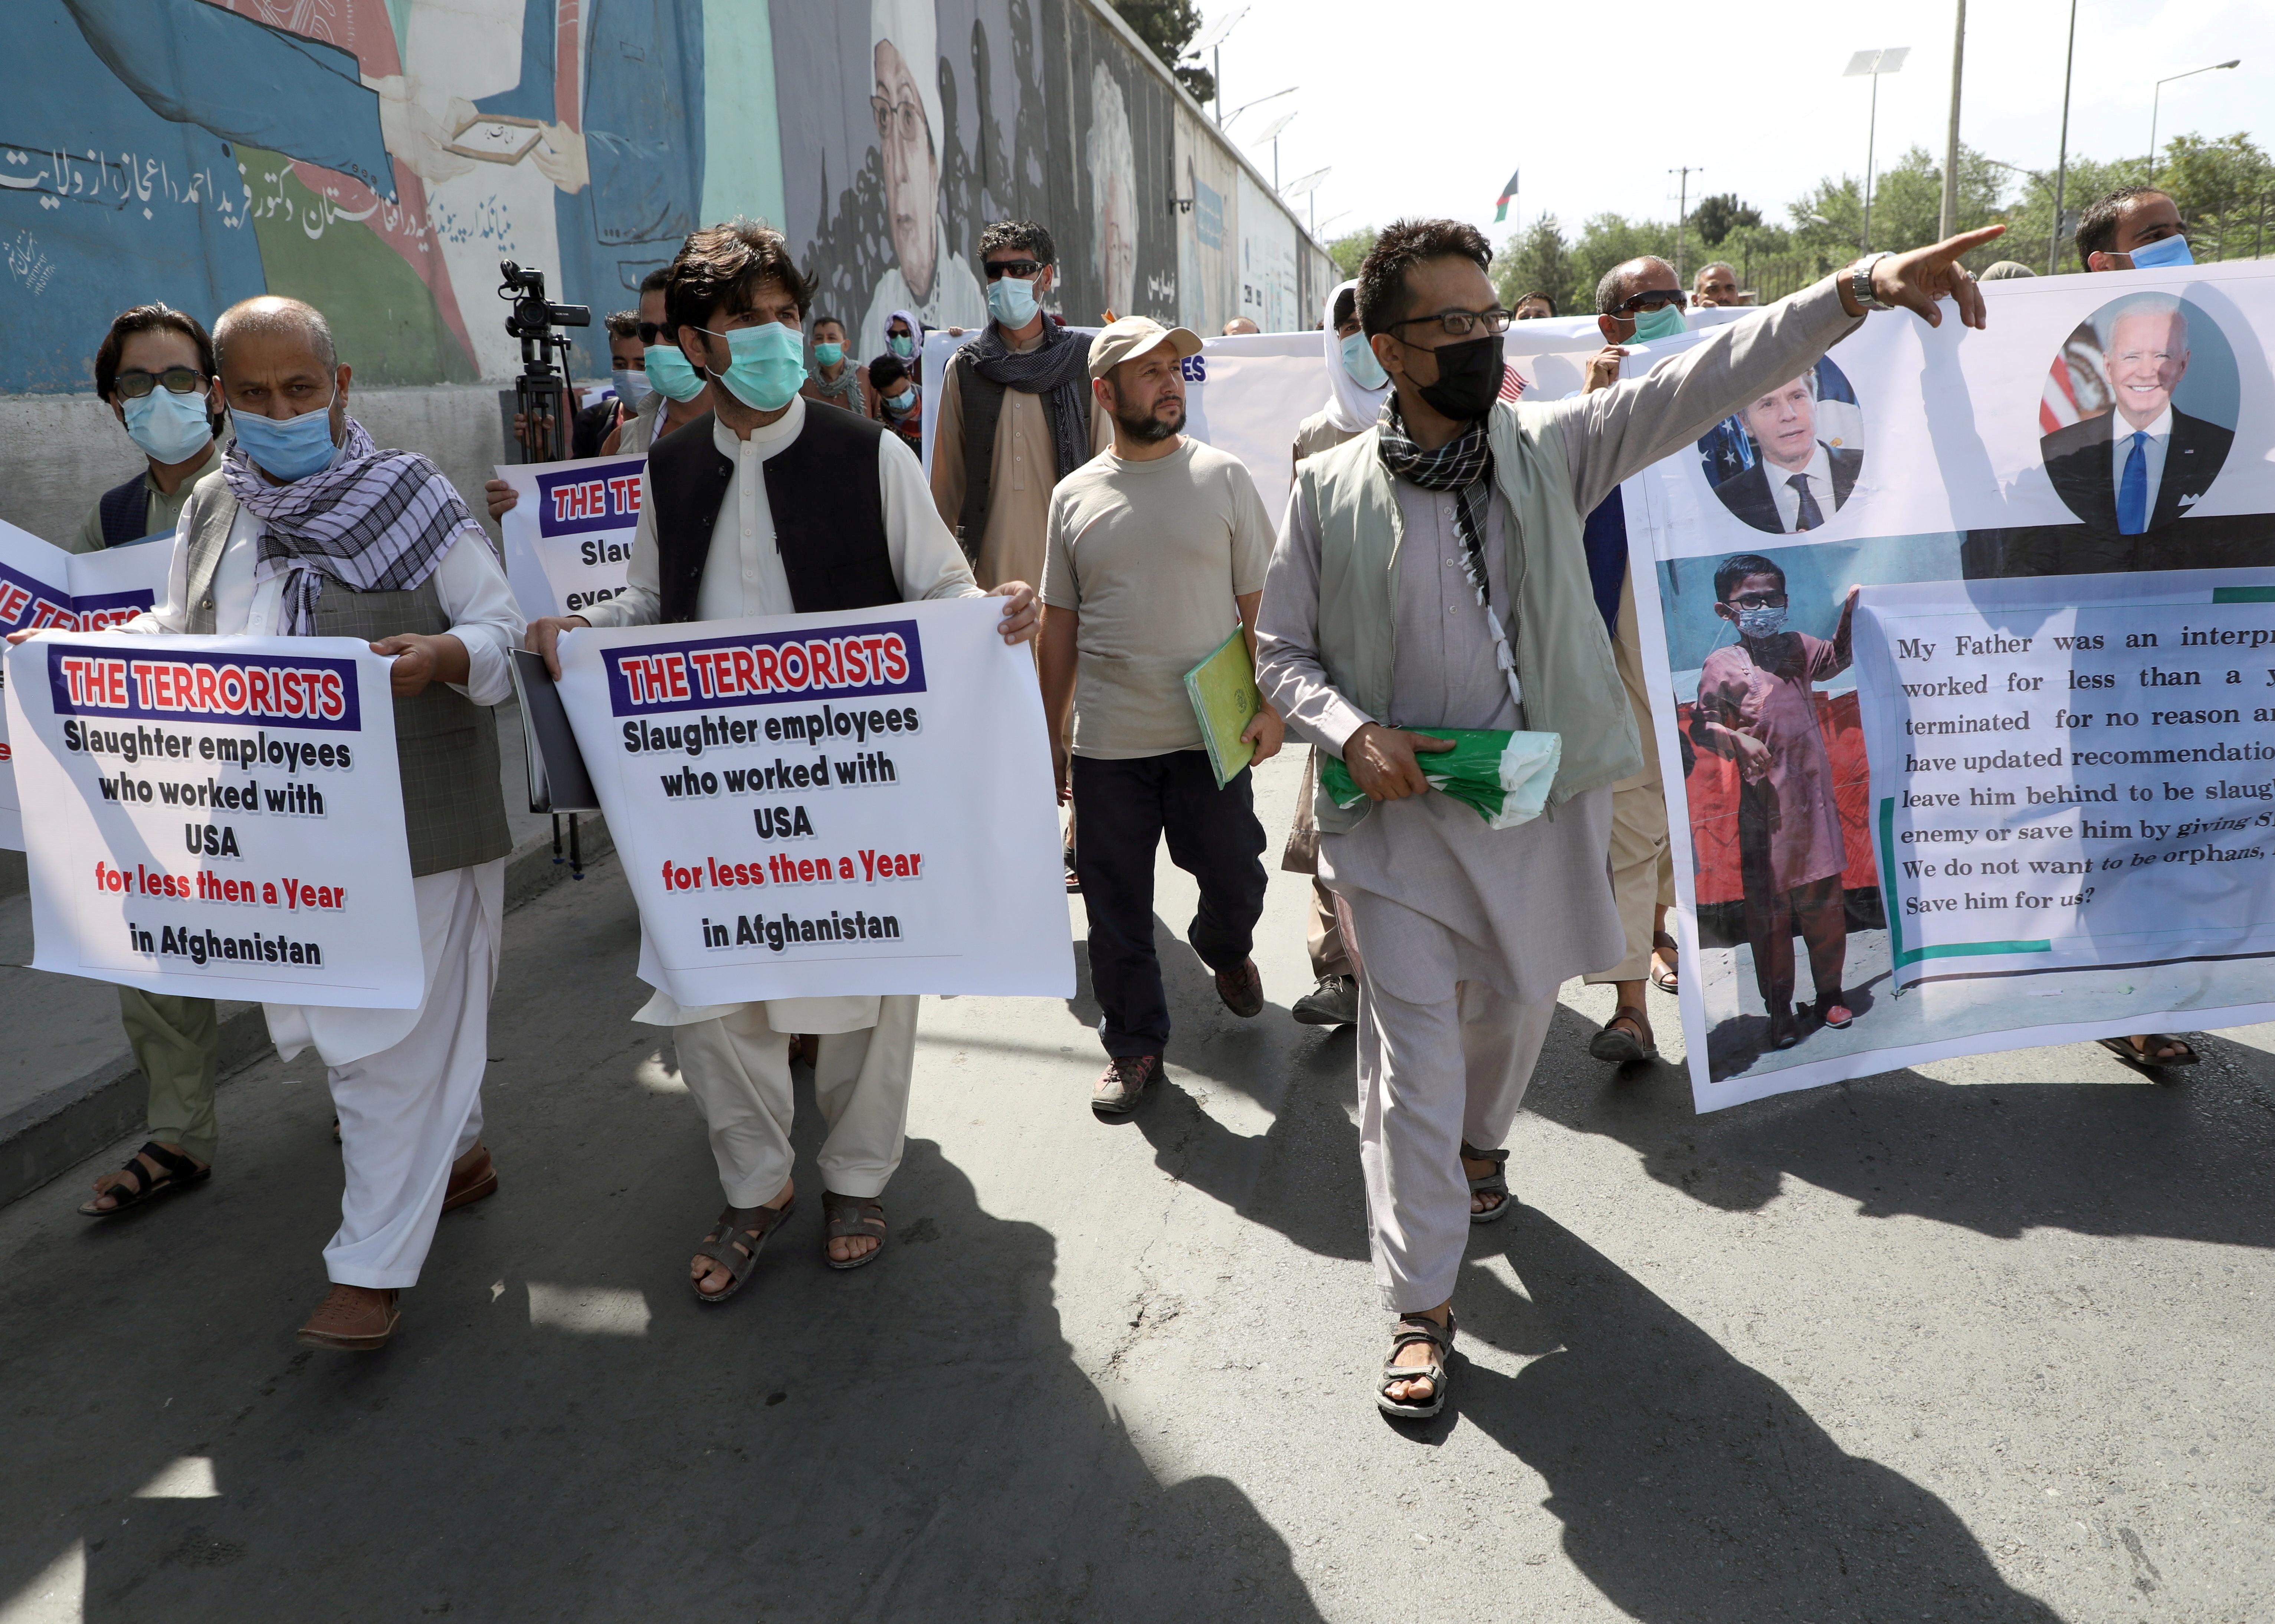 Former Afghan interpreters, who worked with U.S. troops in Afghanistan, demonstrate in front of the U.S. embassy in Kabul June 25, 2021. REUTERS/Stringer